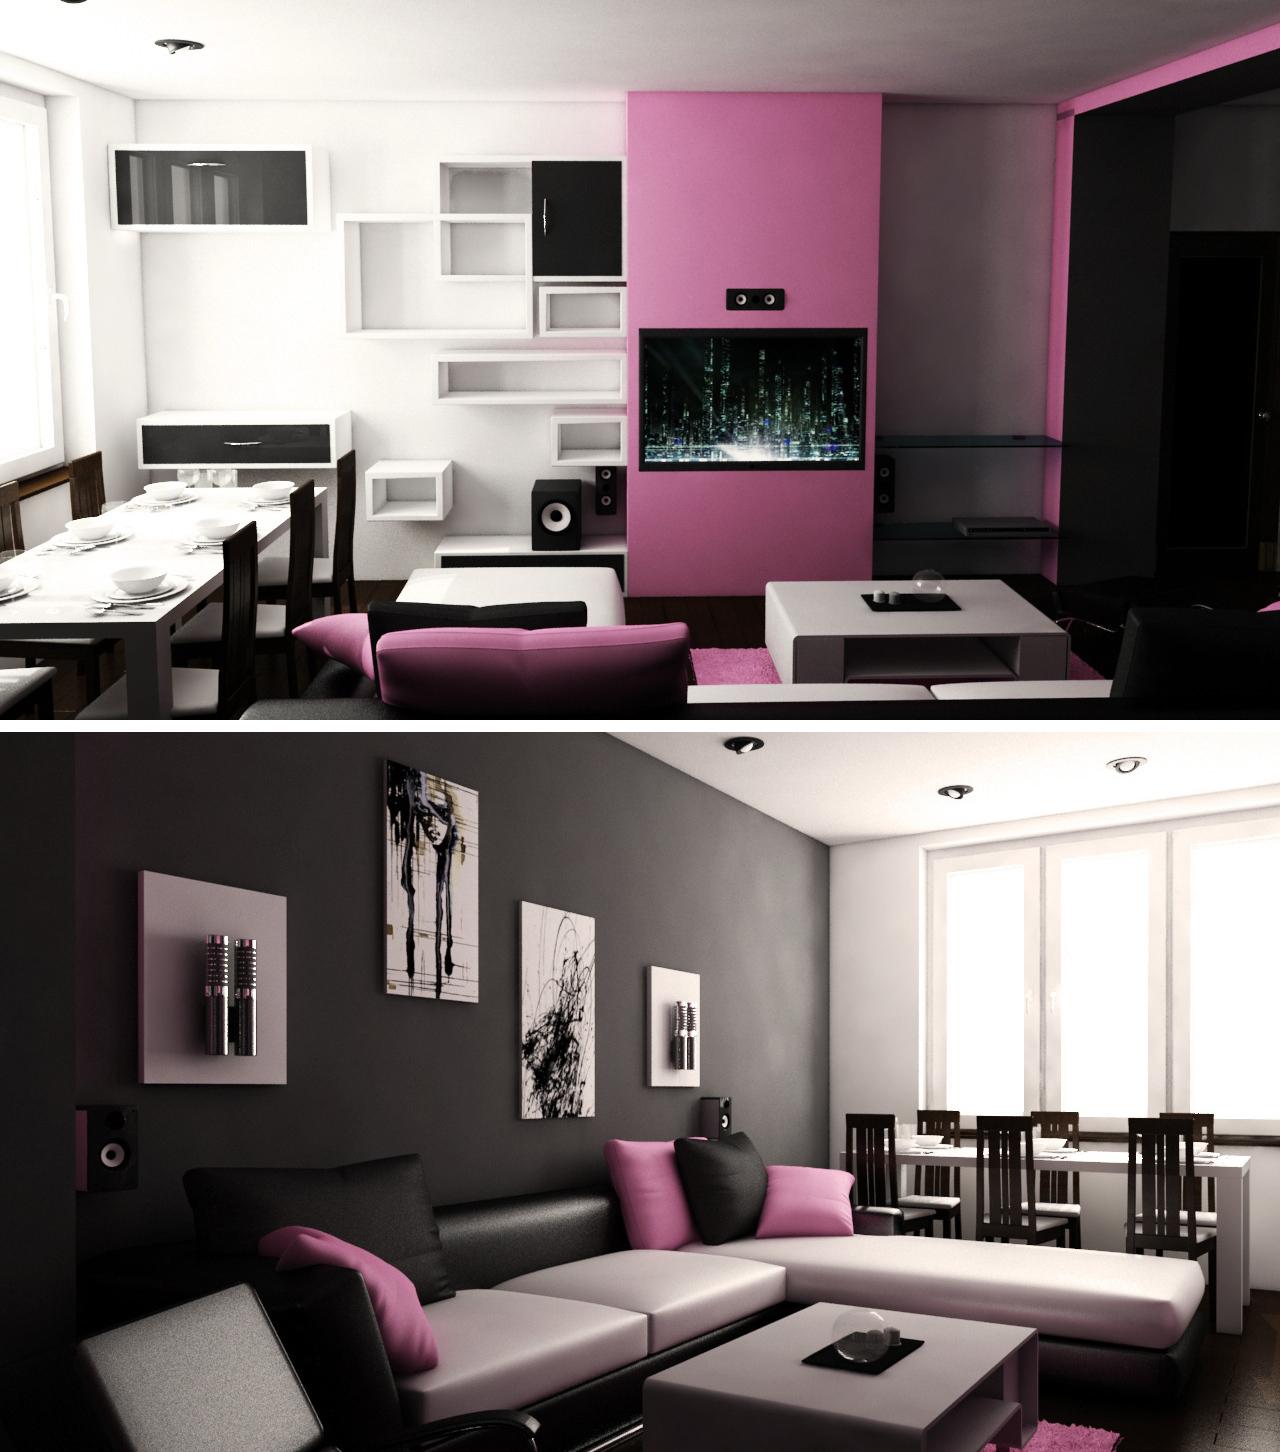 Shano interior design 02 1 c4b121f0 mwn0